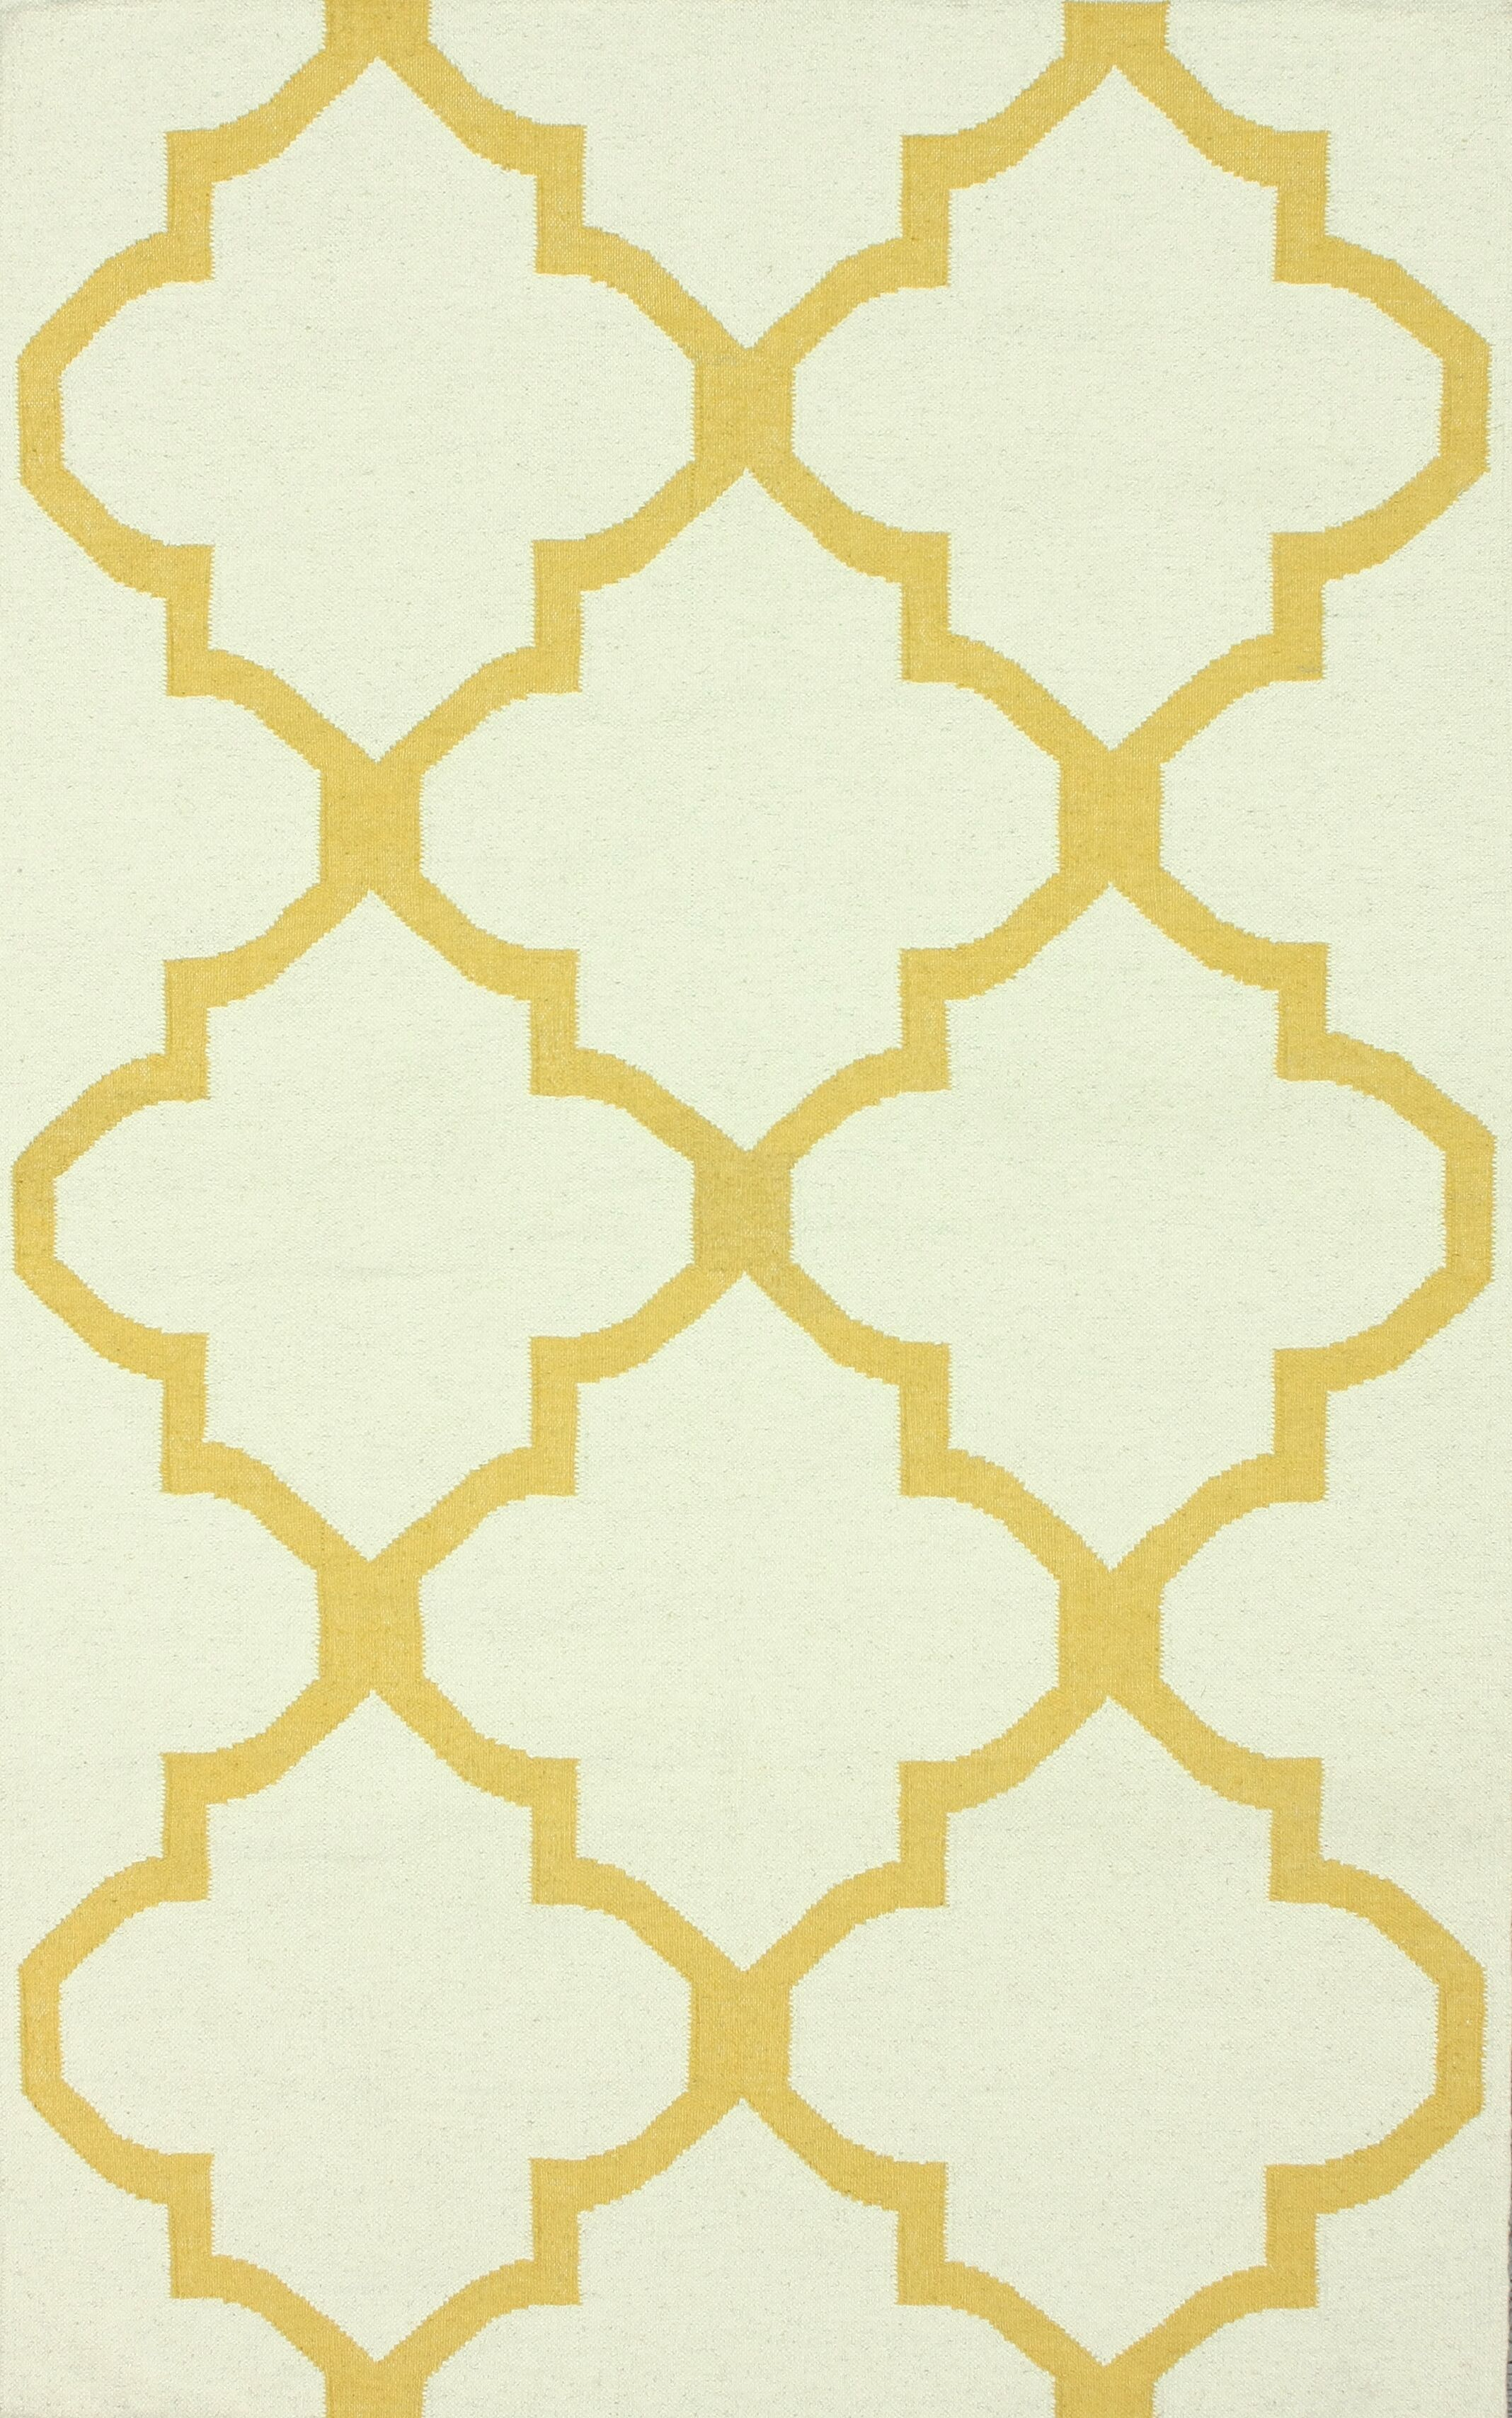 Moderna Hand-Woven Wool Gold Area Rug Rug Size: Rectangle 7'6